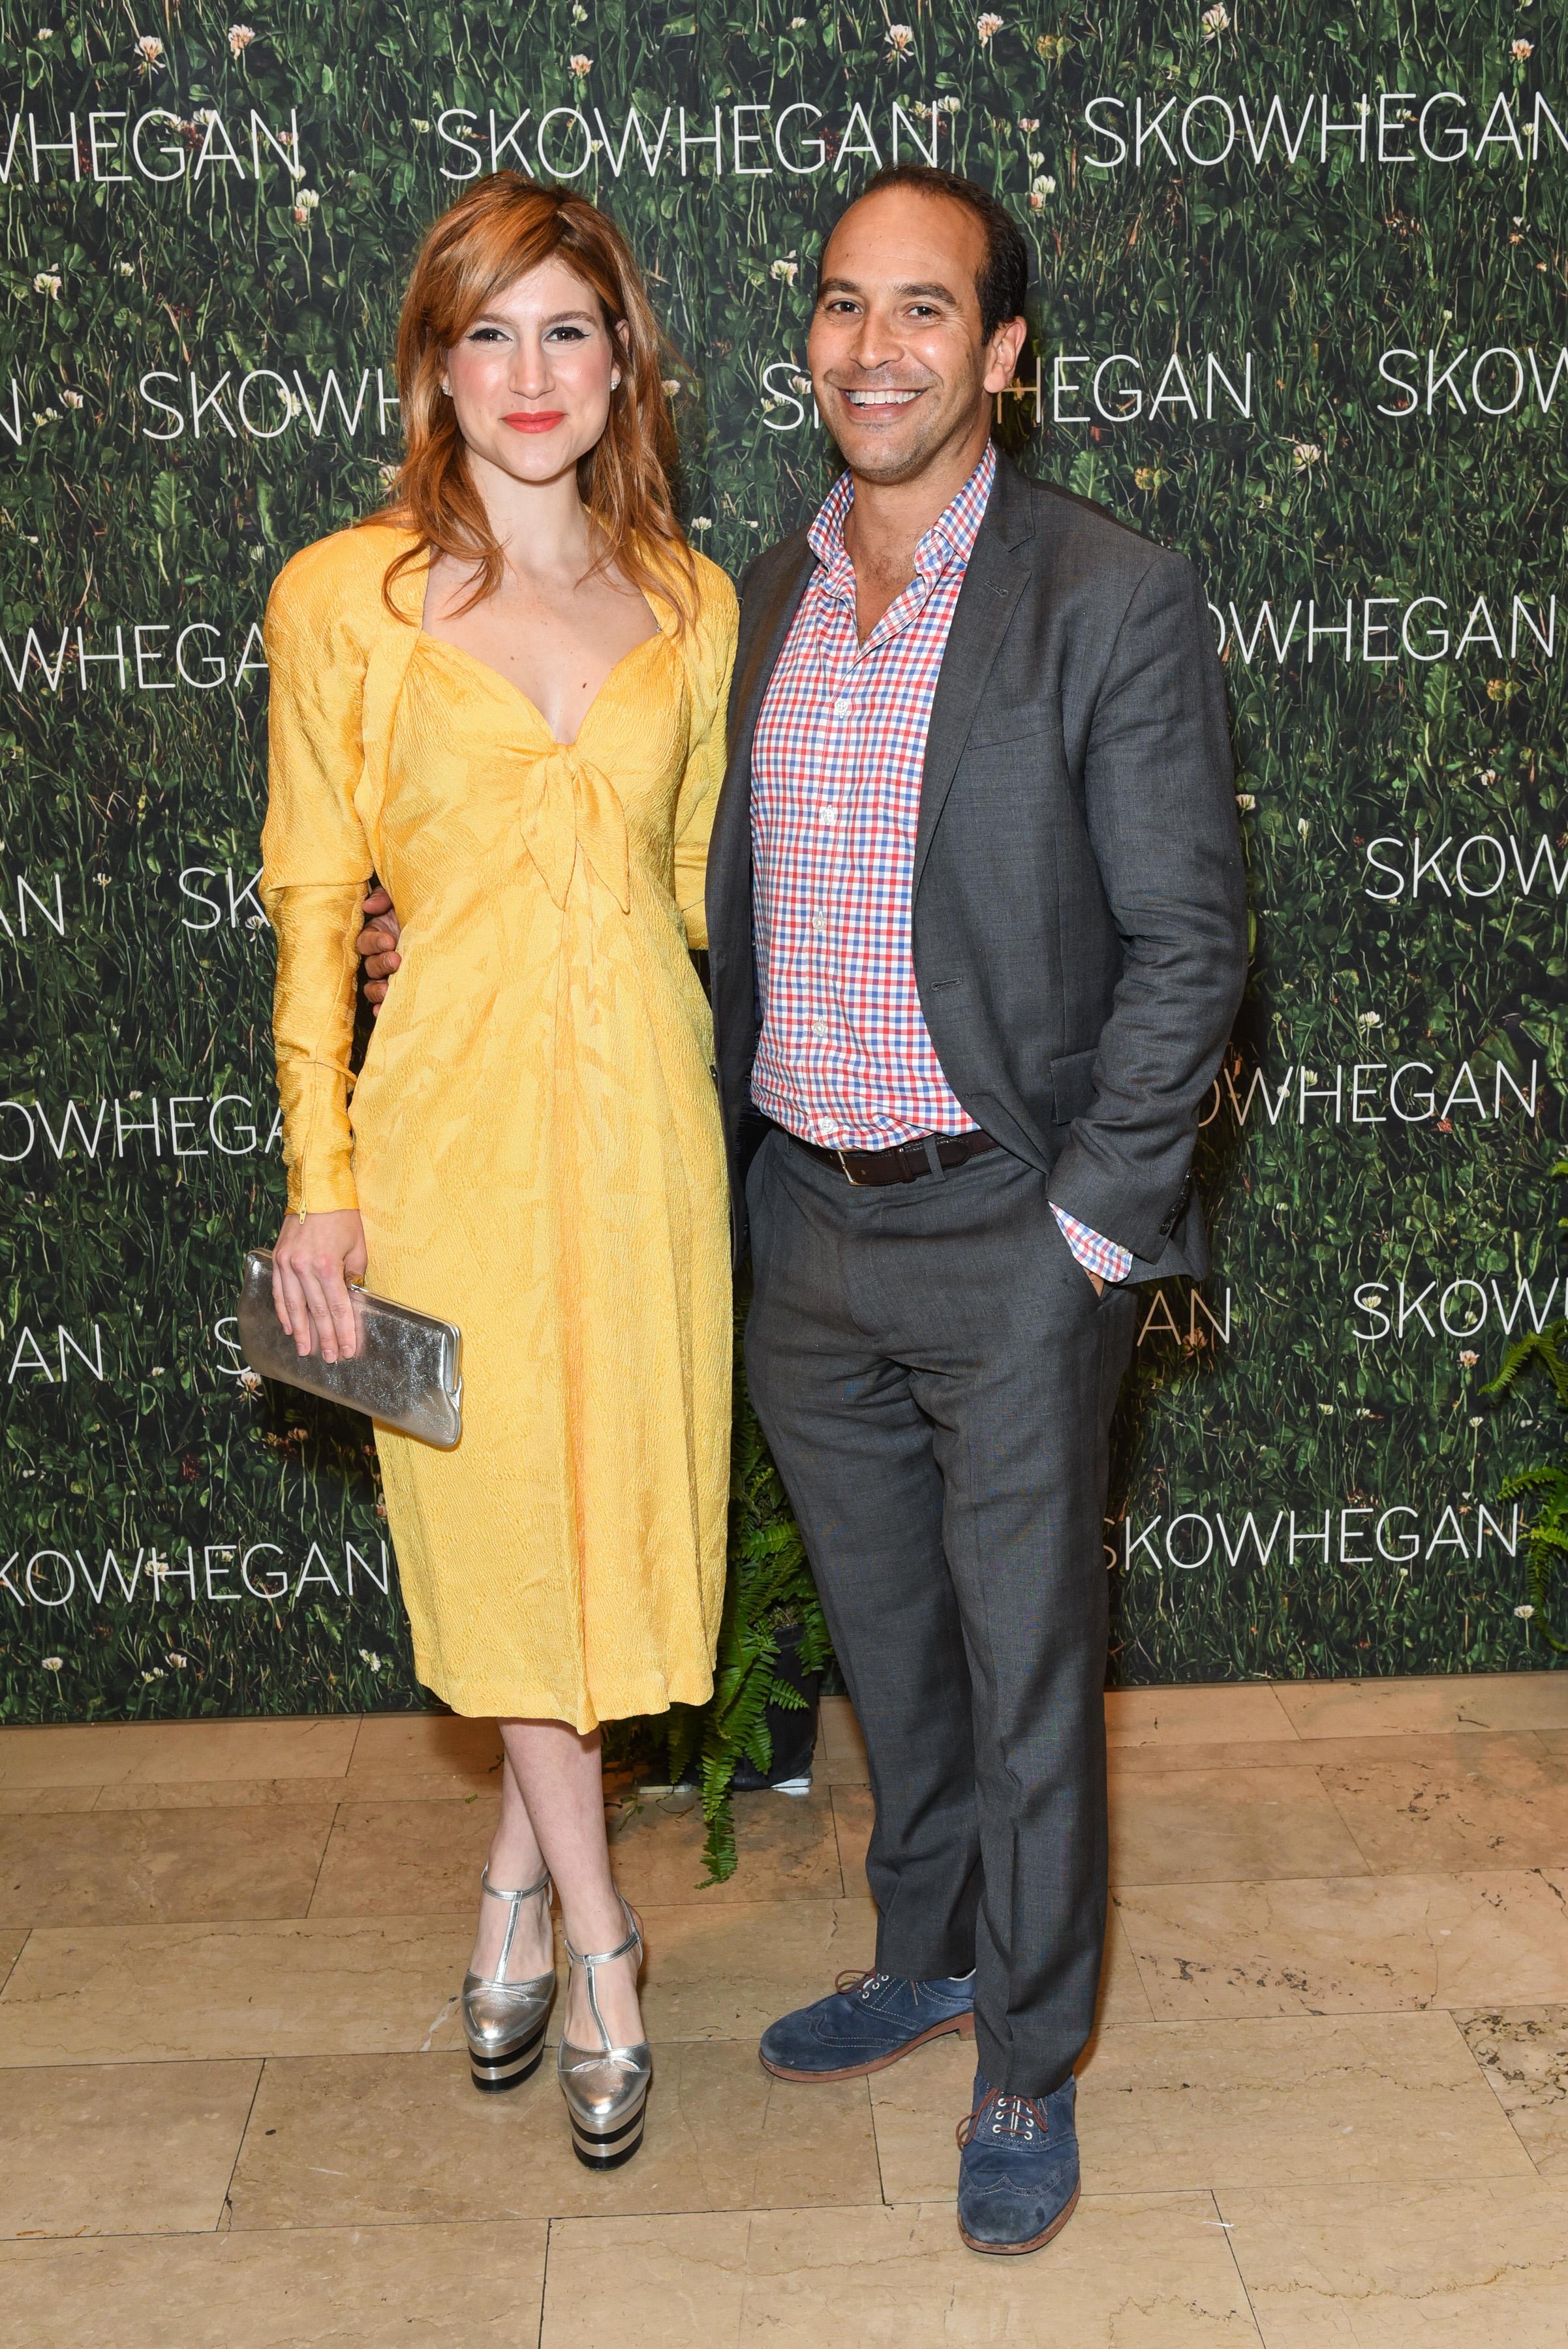 Caroline Hoffman, Bernard Lumpkin==Skowhegan Awards Dinner 2018==The Plaza Hotel, New York, NY==April 24, 2018==�Patrick McMullan==Photo - Presley Ann/PMC====